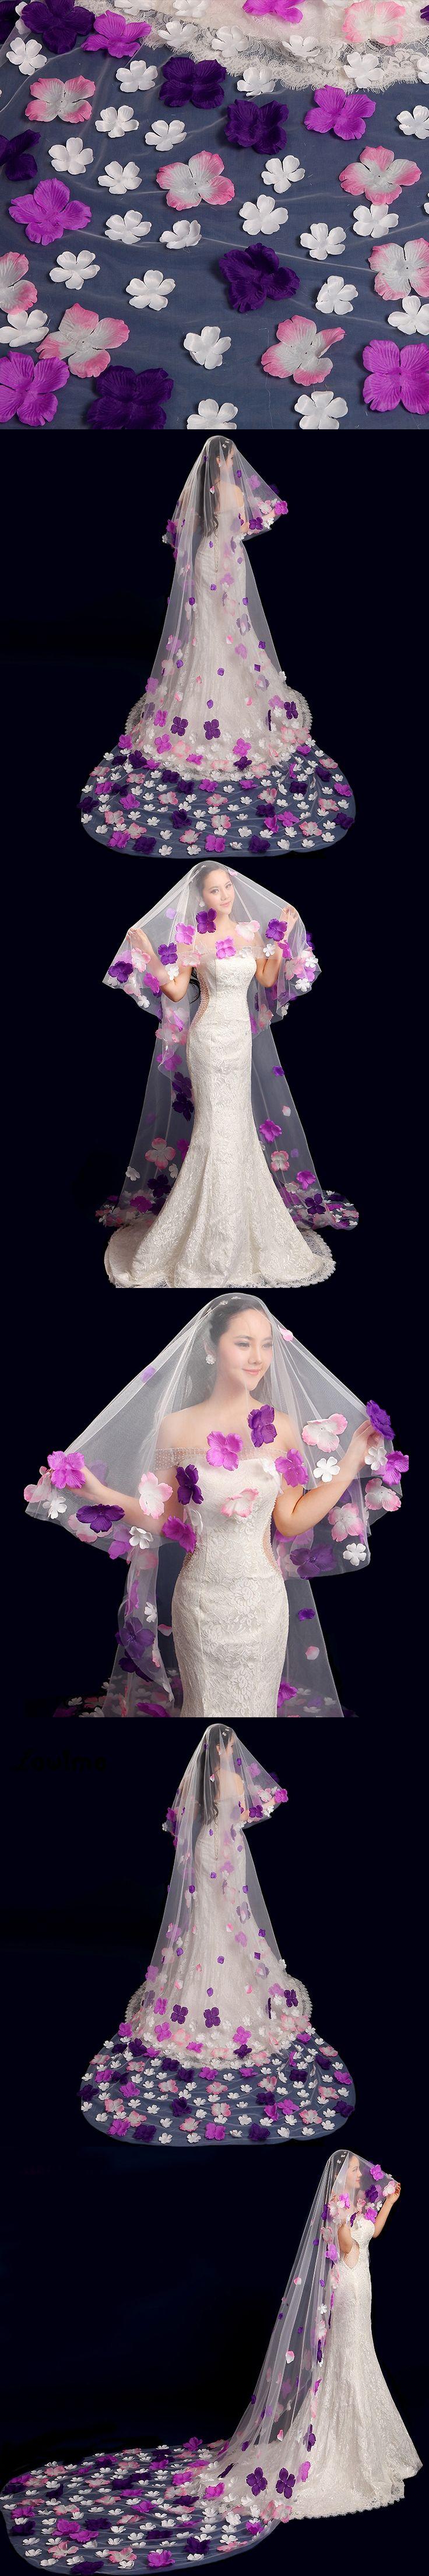 White/Ivory Wedding Veil 3 Meters Long One Layer Cut Edge Adult Bridal Veil With Handmade Flowers Appliques velos de novia